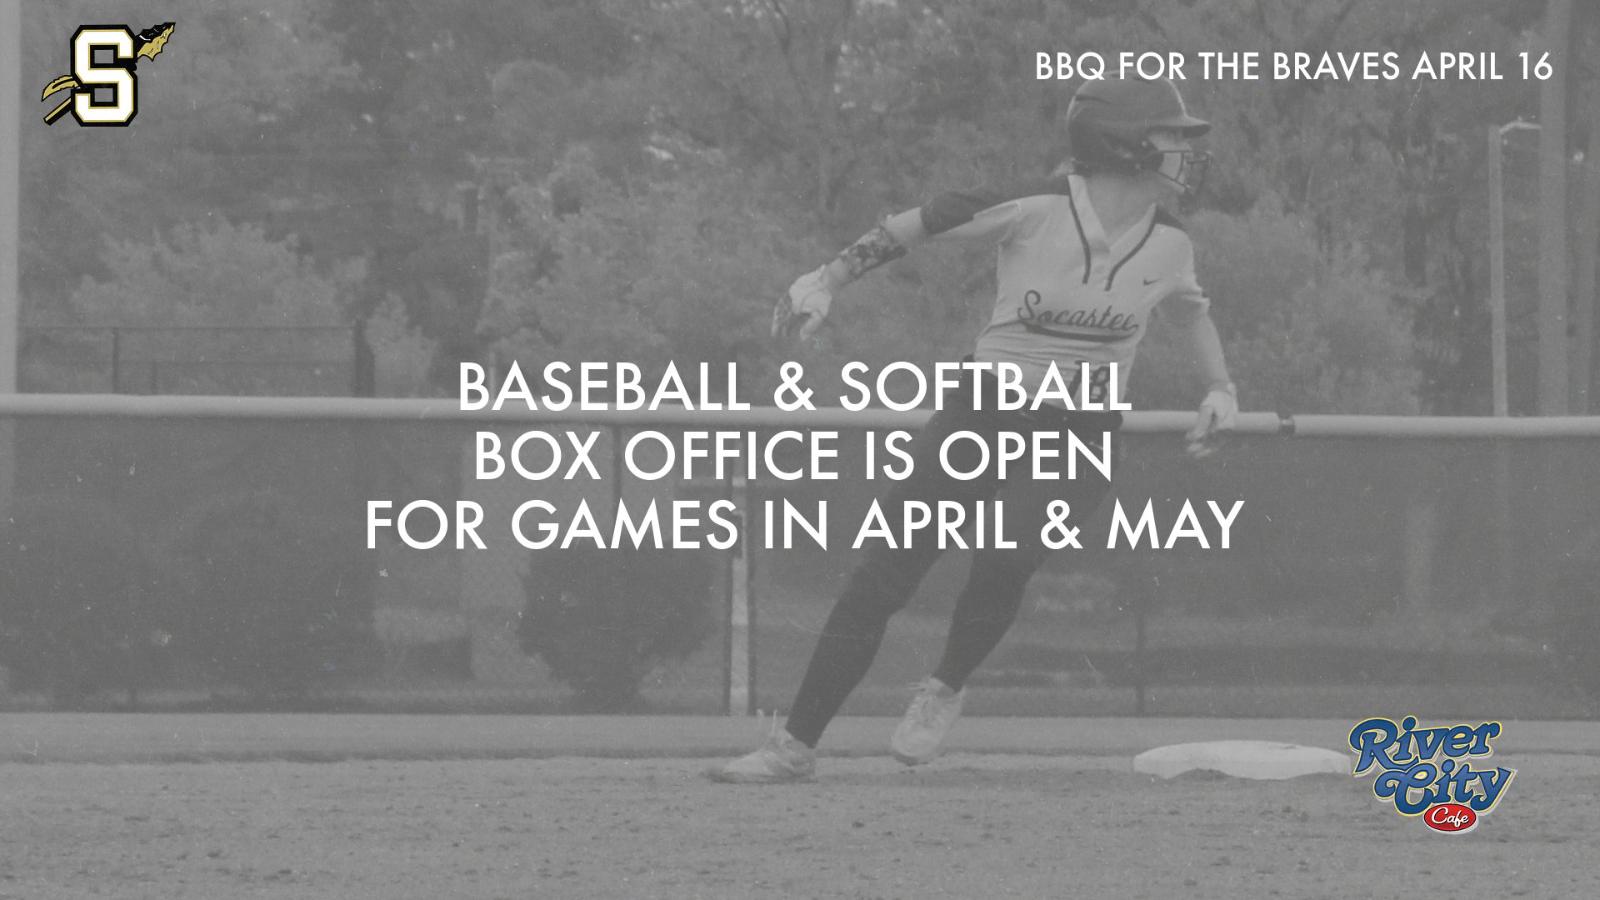 Baseball & Softball Box Office is Open.